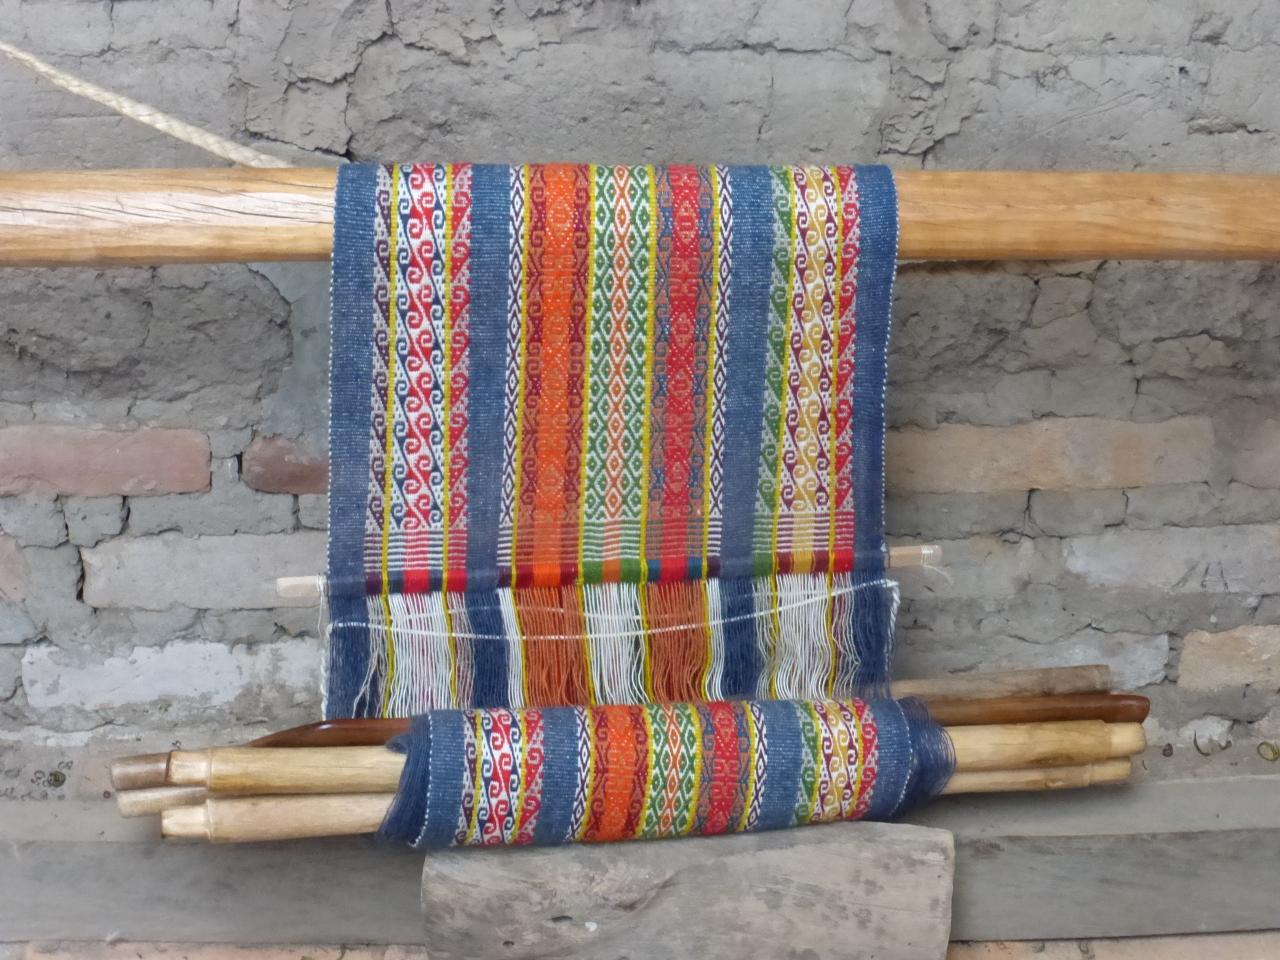 Backstrap Weaving Display